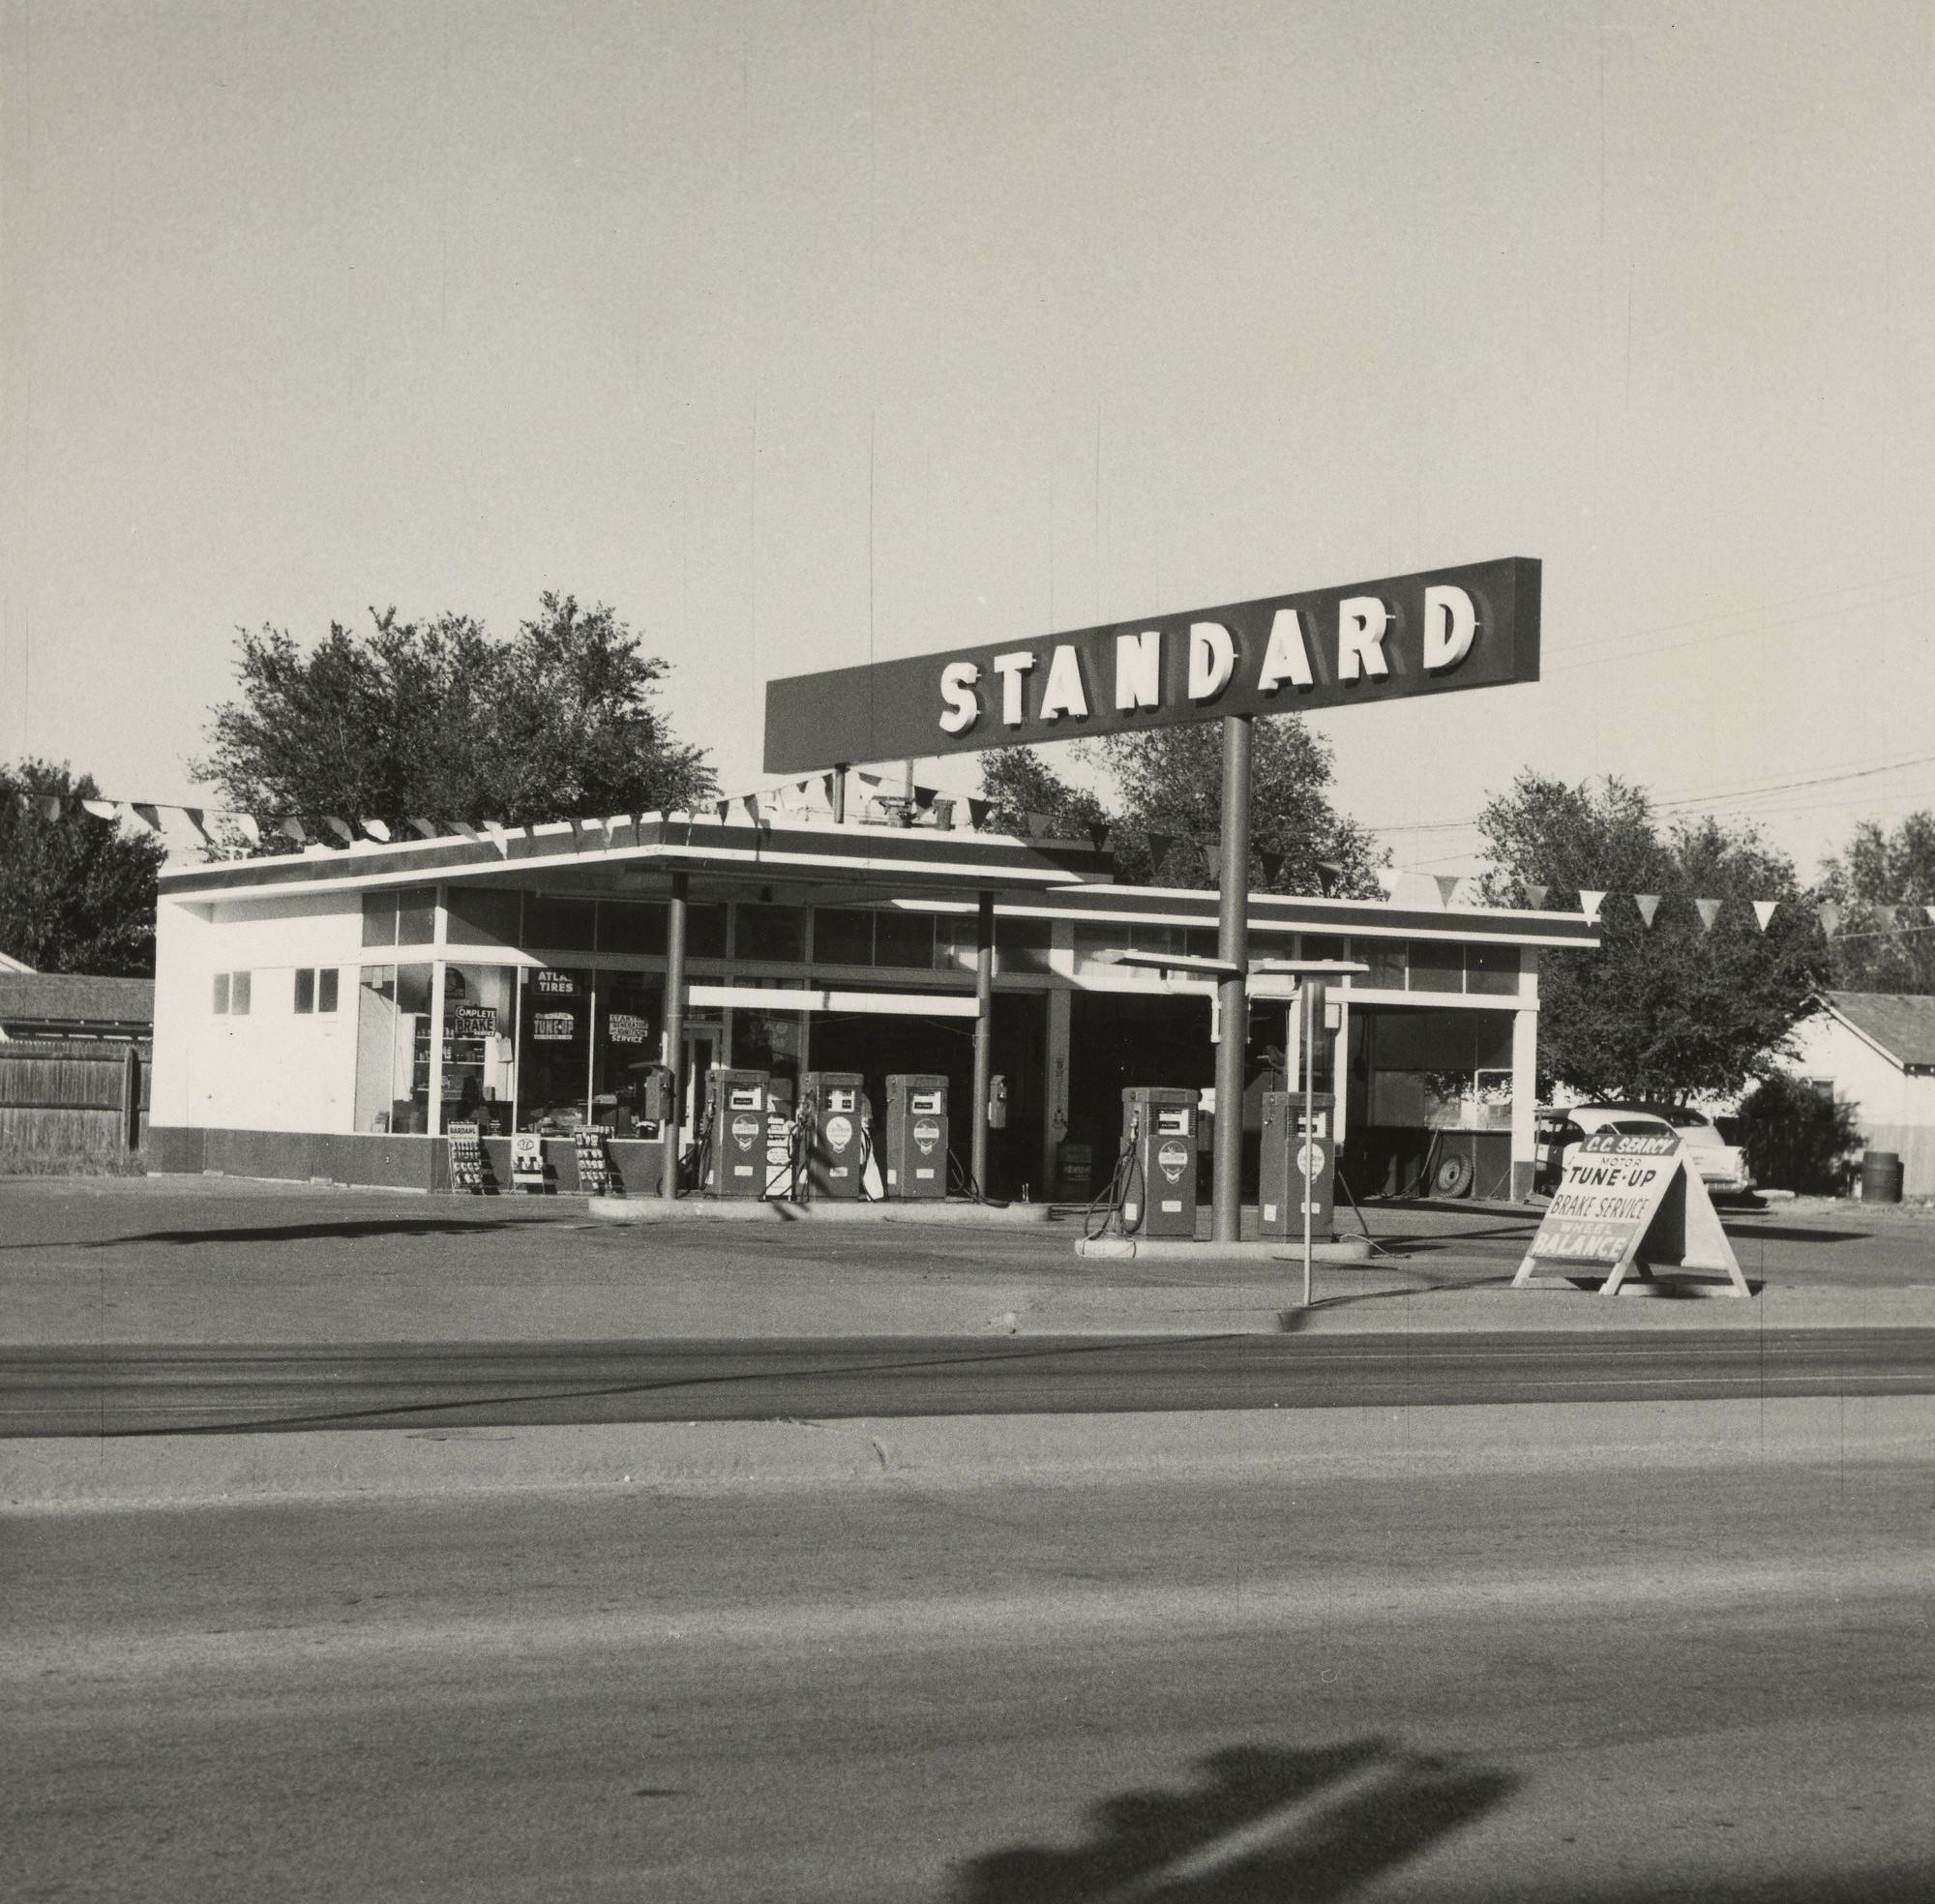 © Ed Ruscha-The J. Paul Getty Museum, Los Angeles / Standard, Amarillo, Texas, 1962